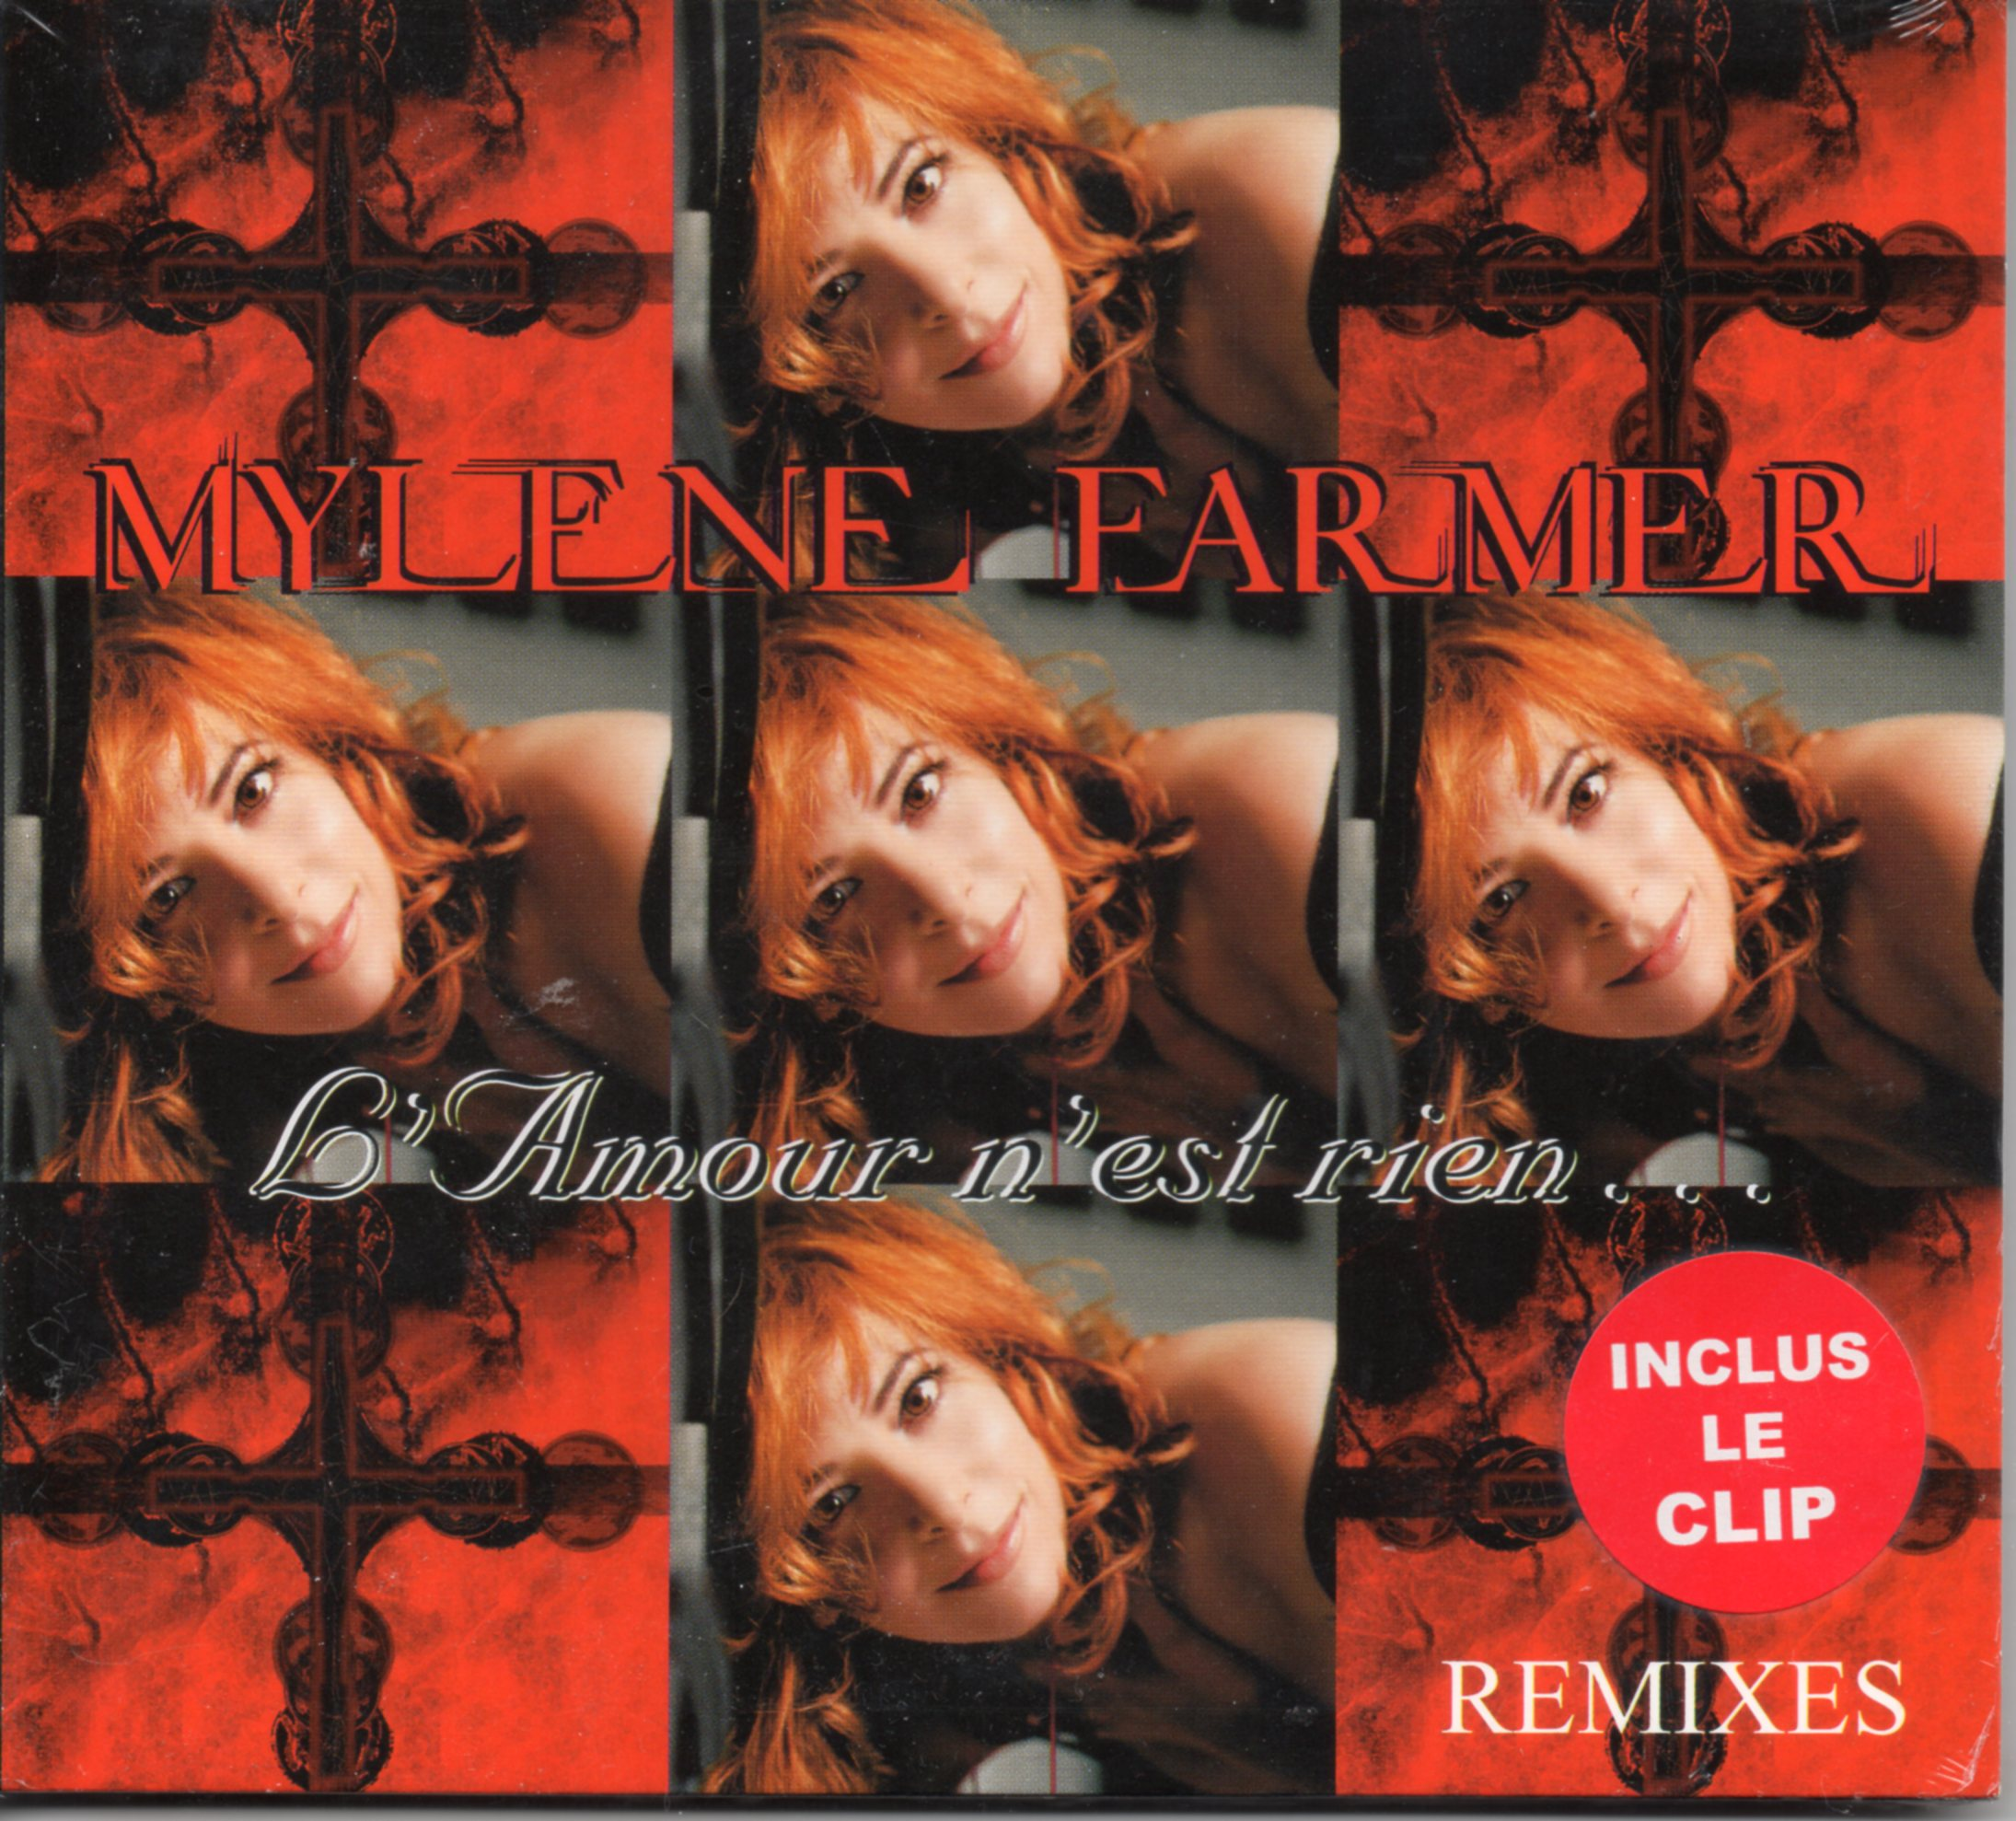 Mylène FARMER - L'amour N'est Rien - Remixes - 4-track Digipack